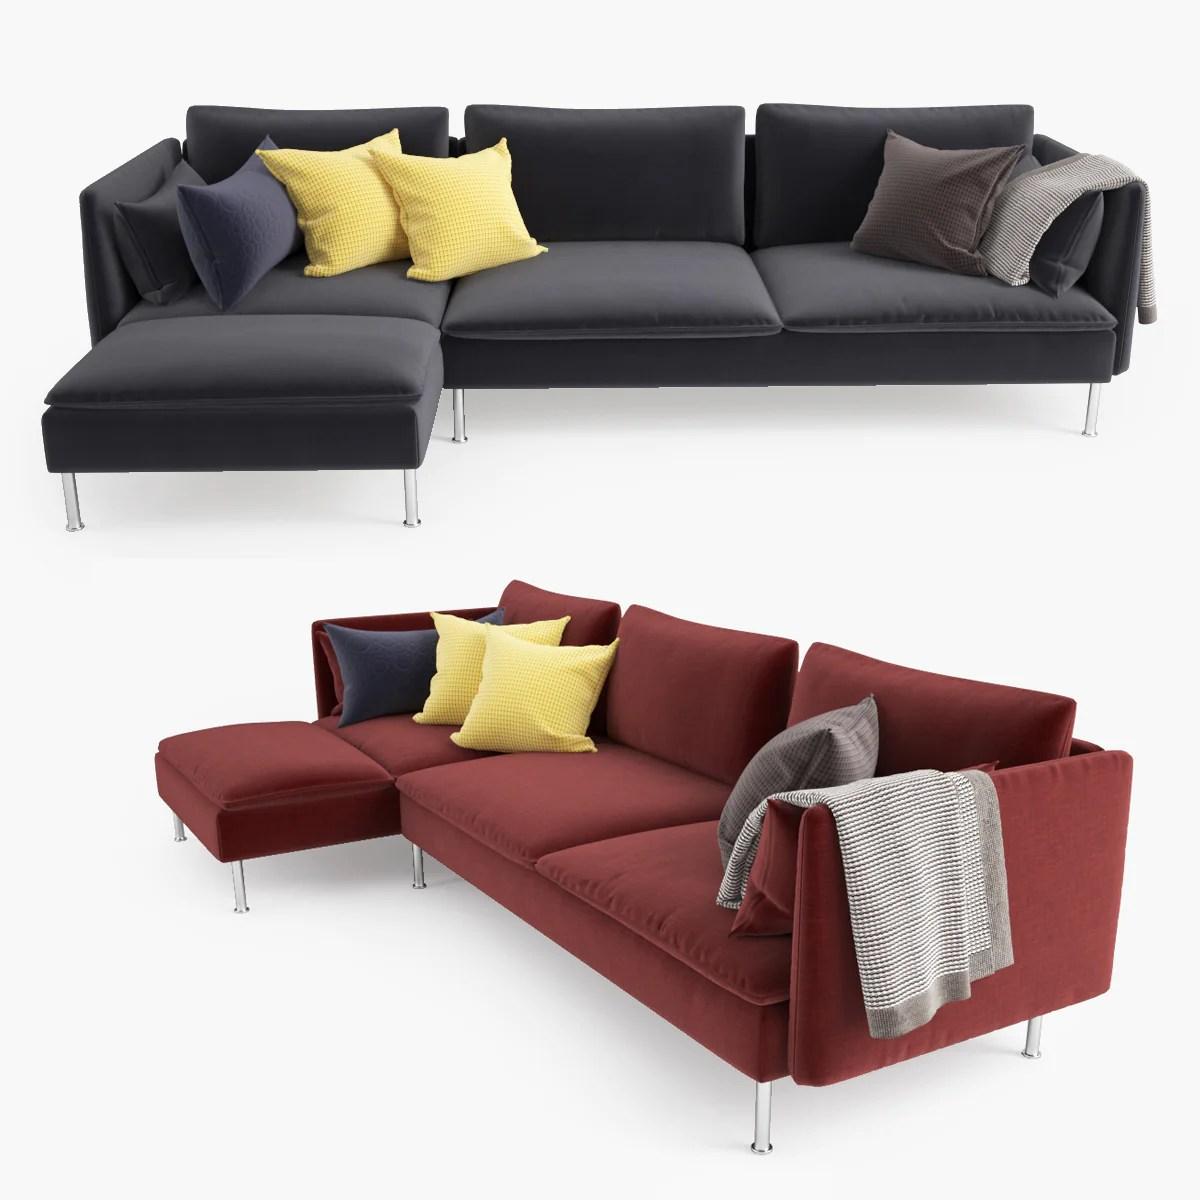 Chaiselongue Sofa Ikea – Caseconrad.com